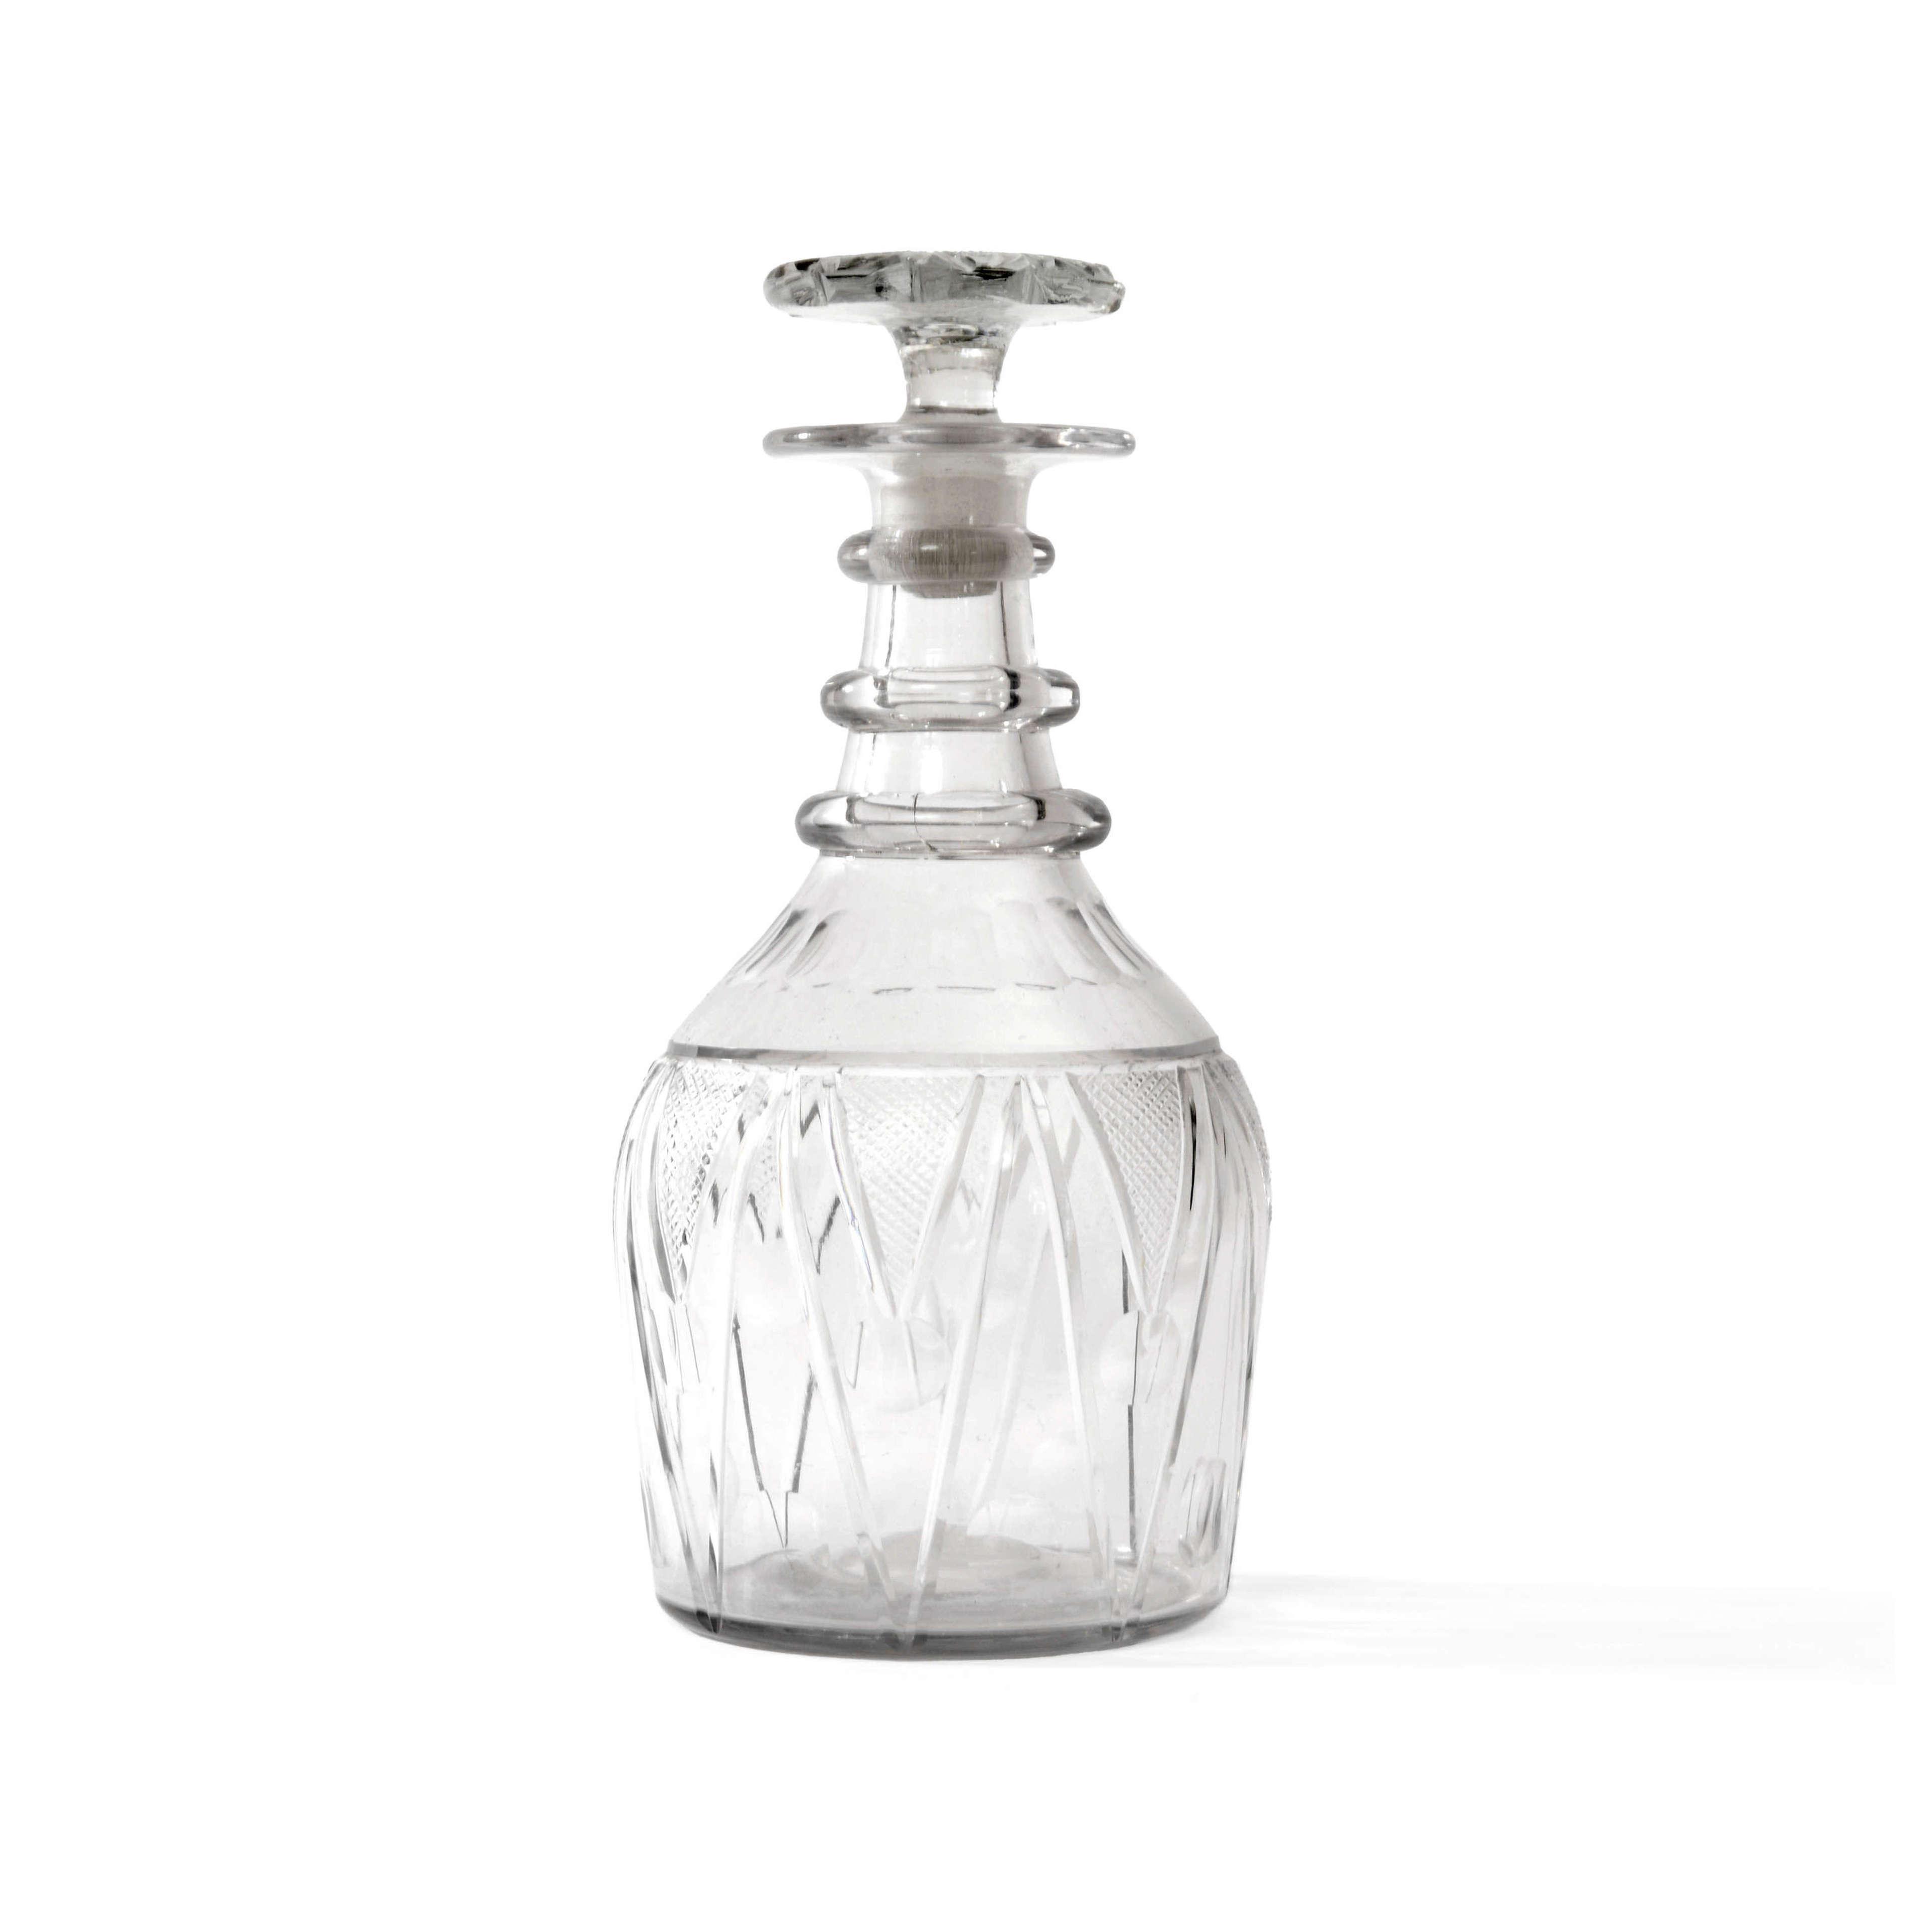 Regency Prussian three ring glass decanter